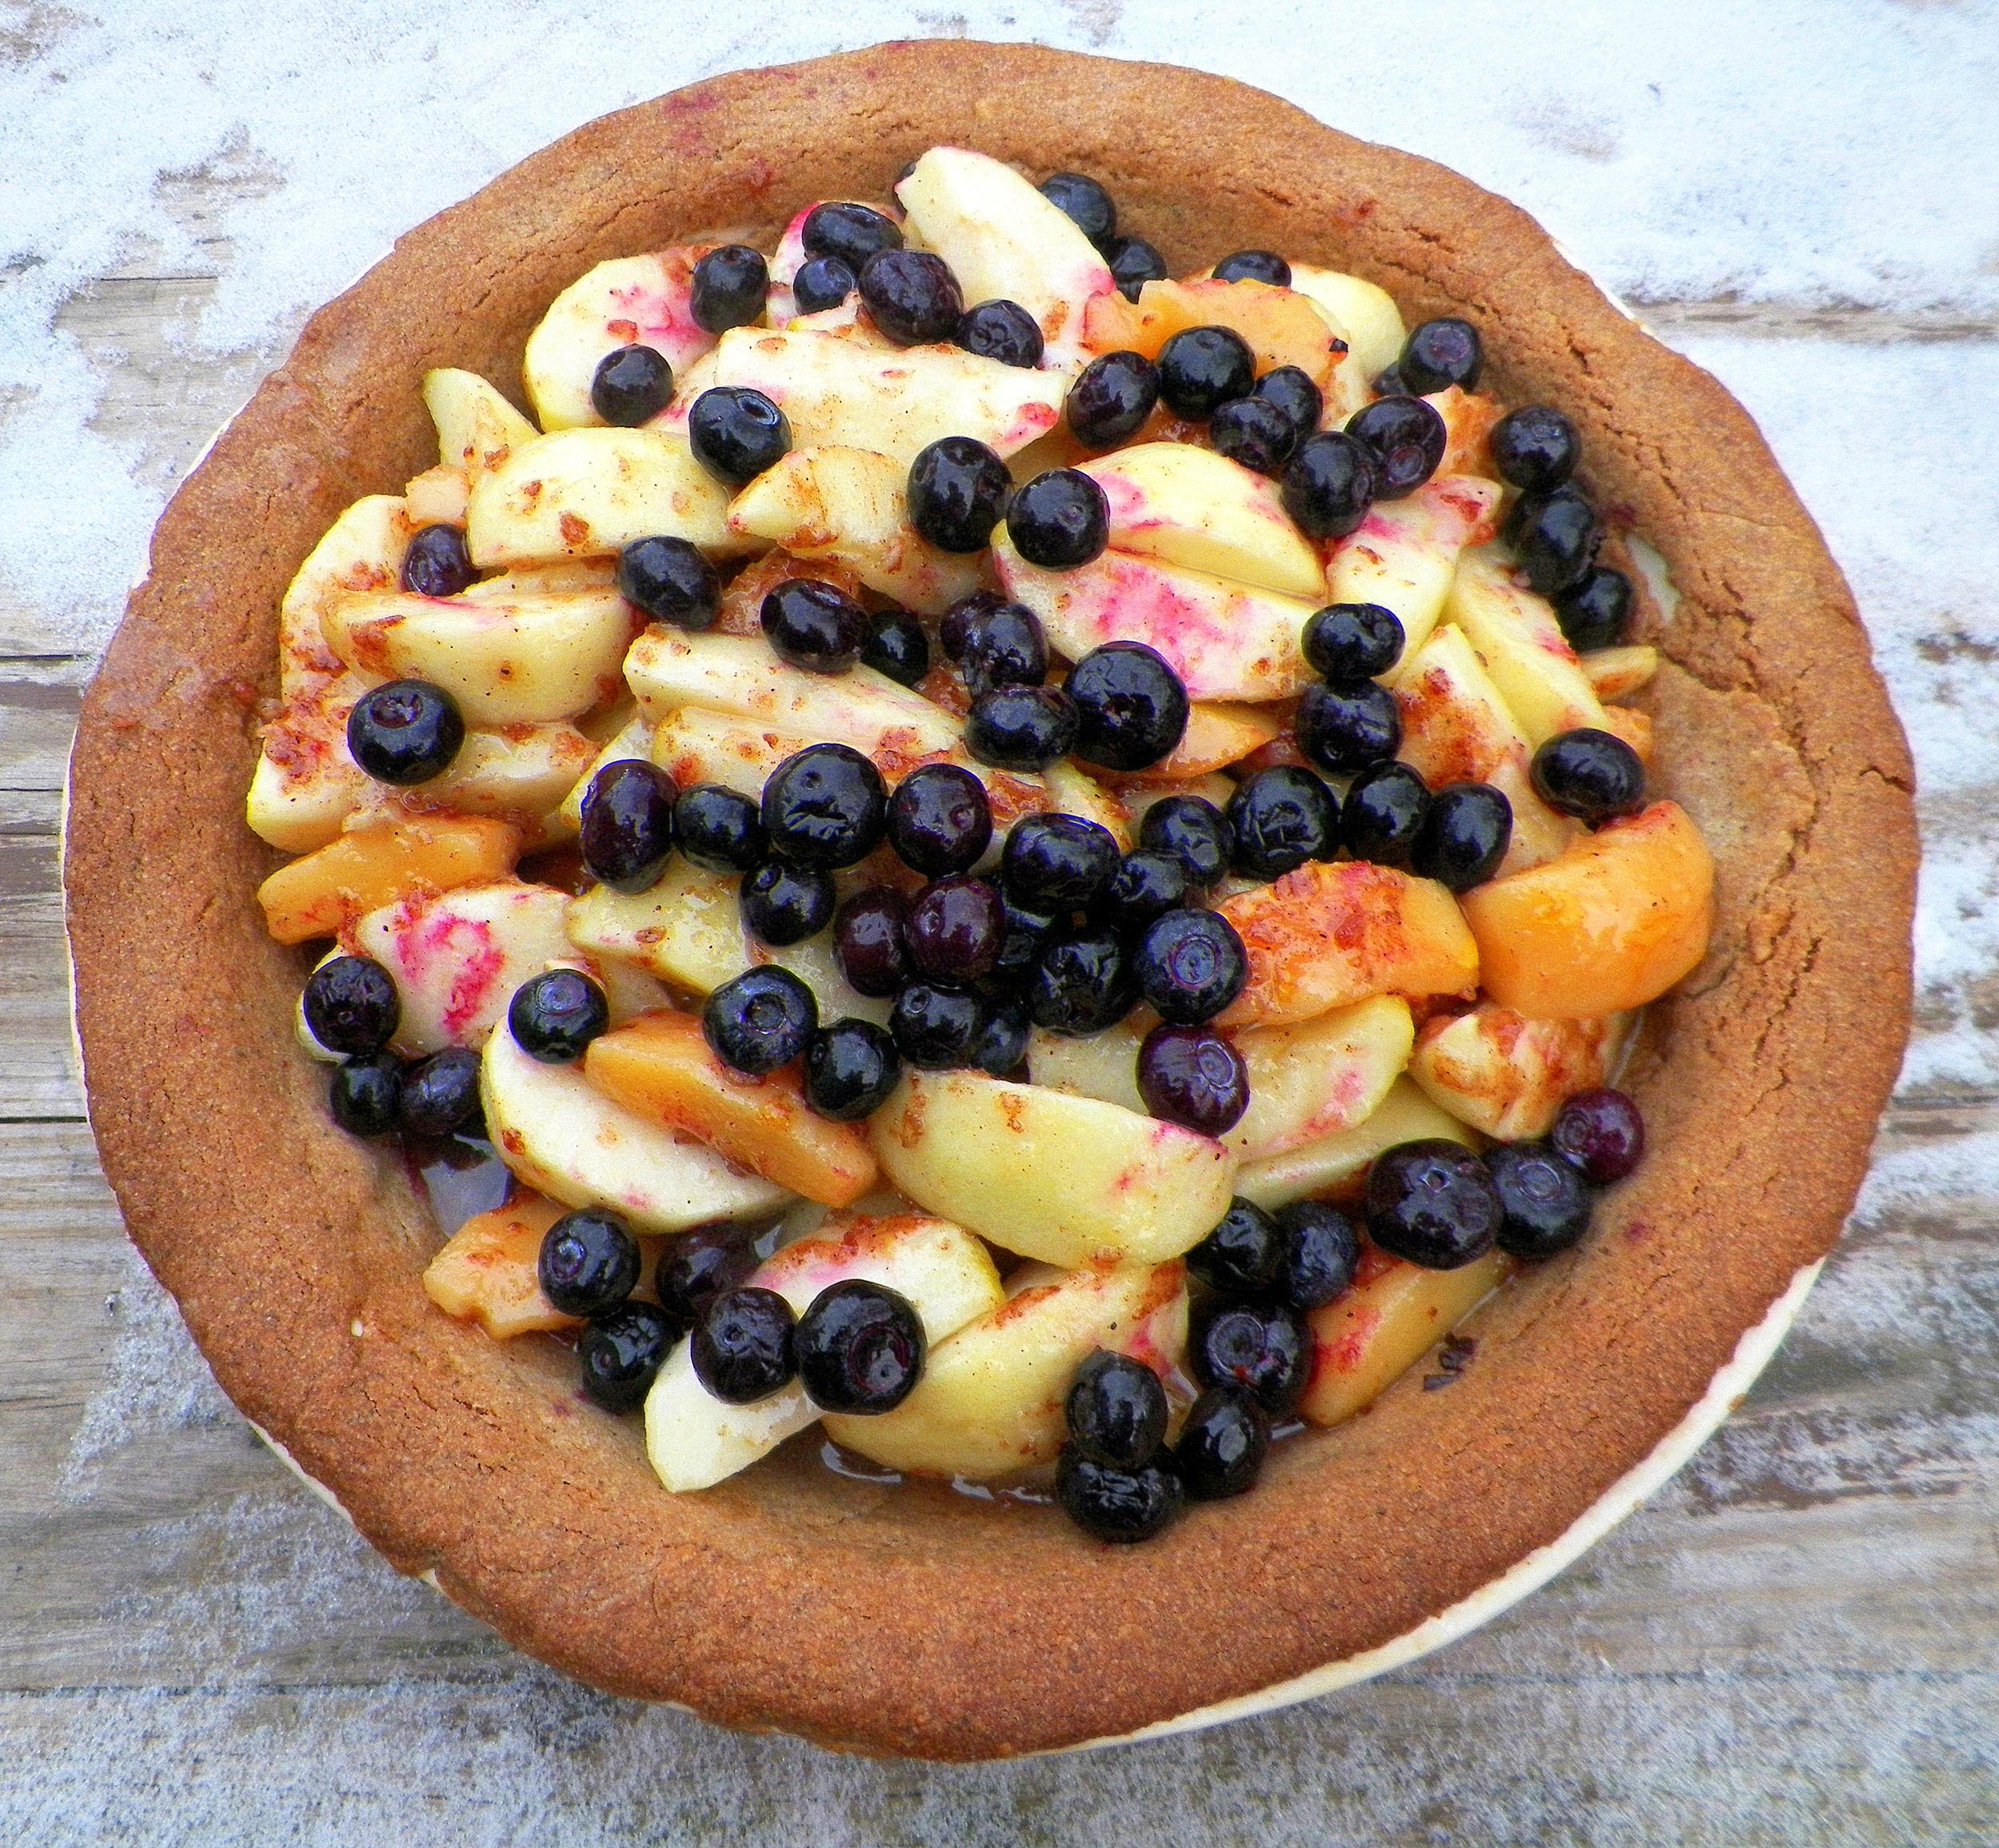 apple quince blueberry pie w acorn crust  11-24-13.JPG